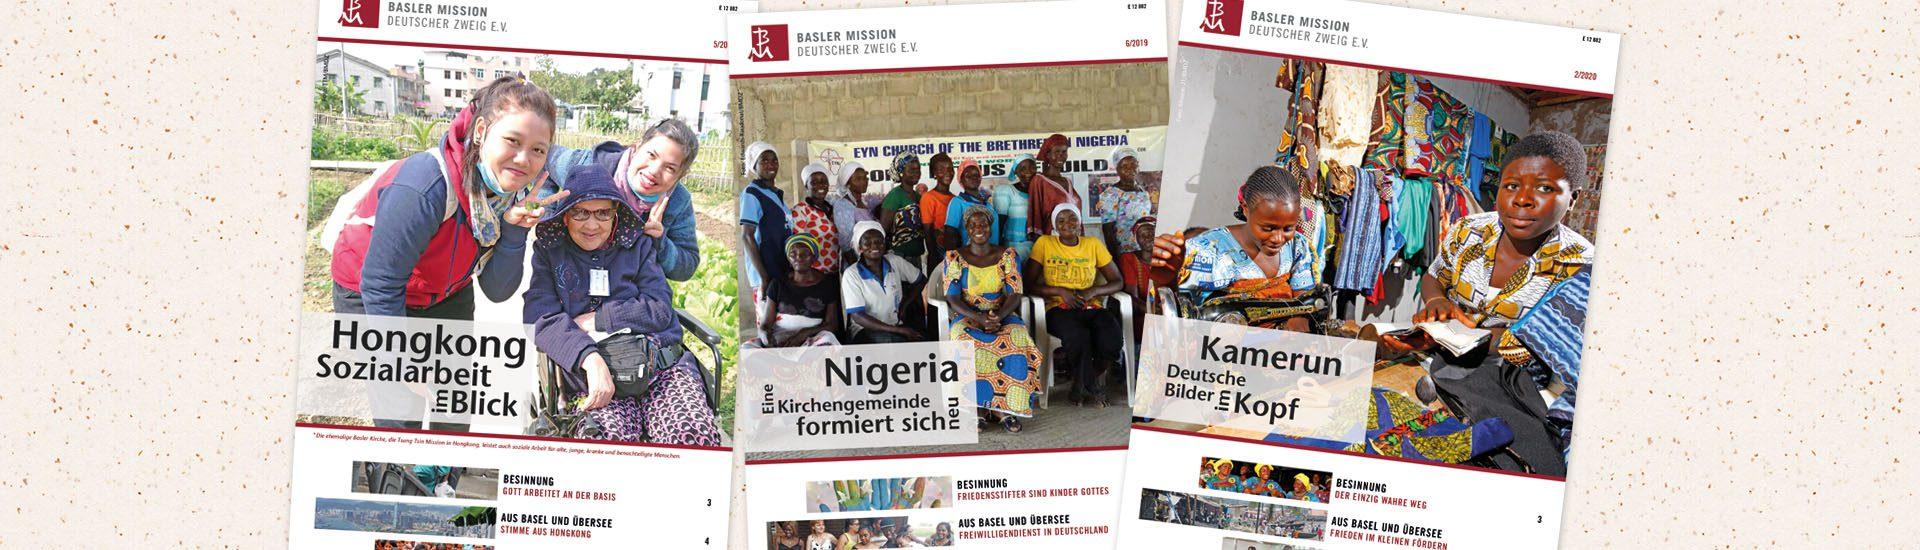 BMDZ_Nachrichtenblatt_Sudhaus7_Cover